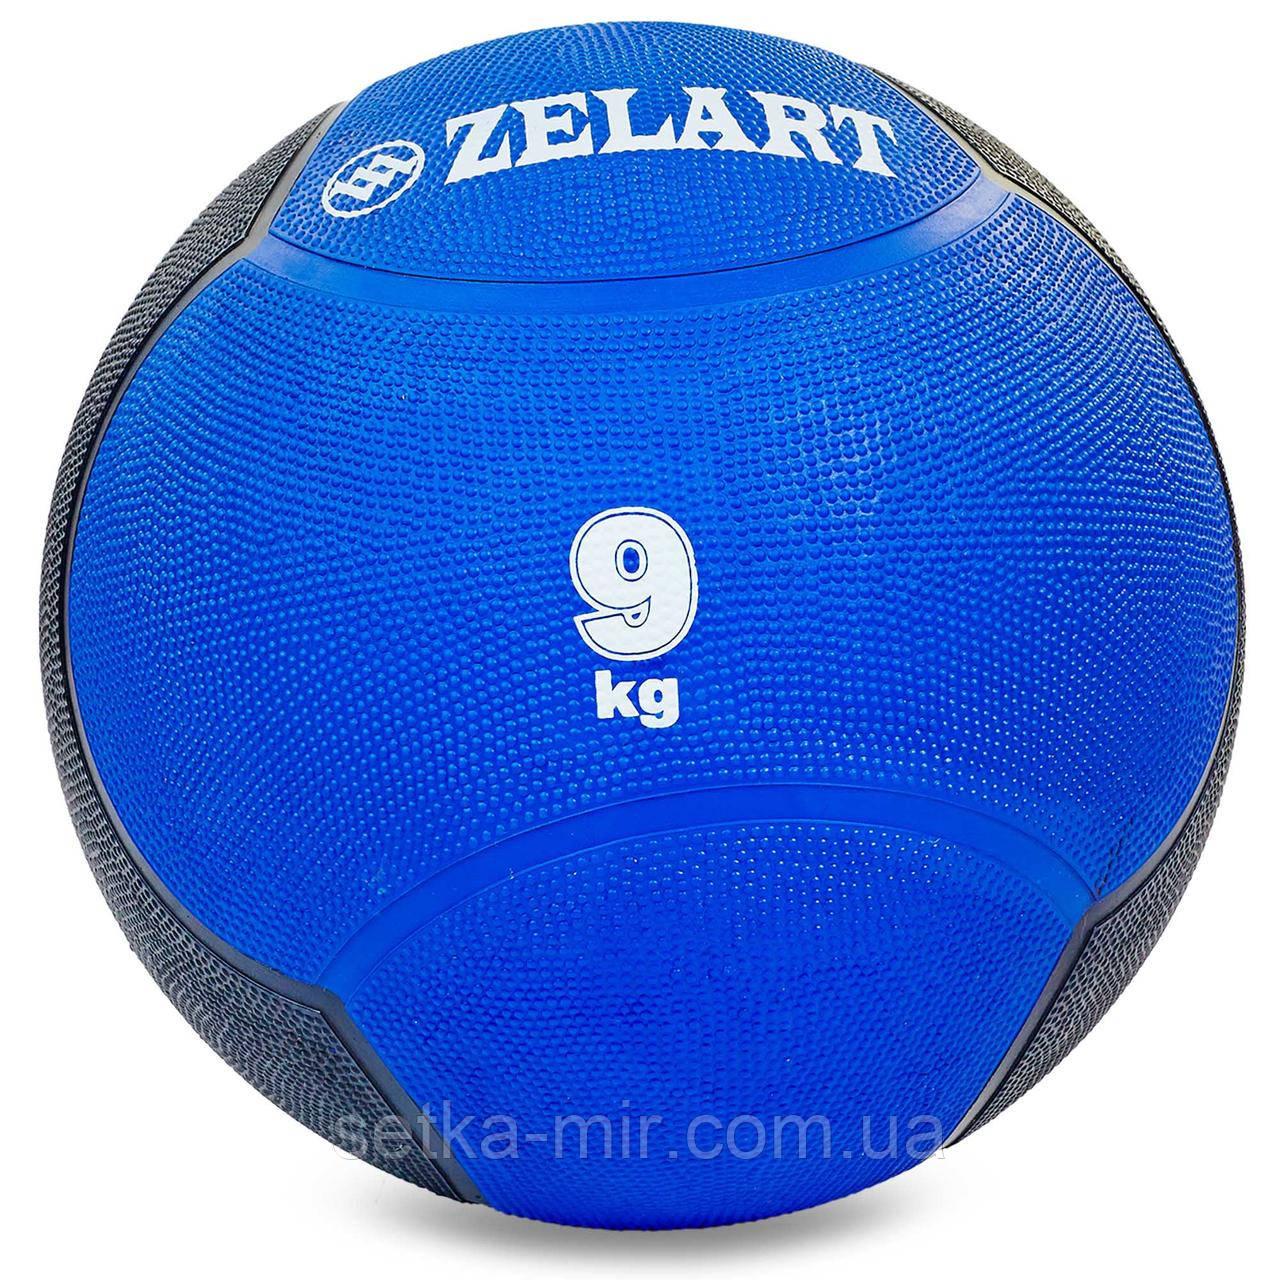 Мяч медицинский медбол Zelart Medicine Ball FI-5121-9 9кг